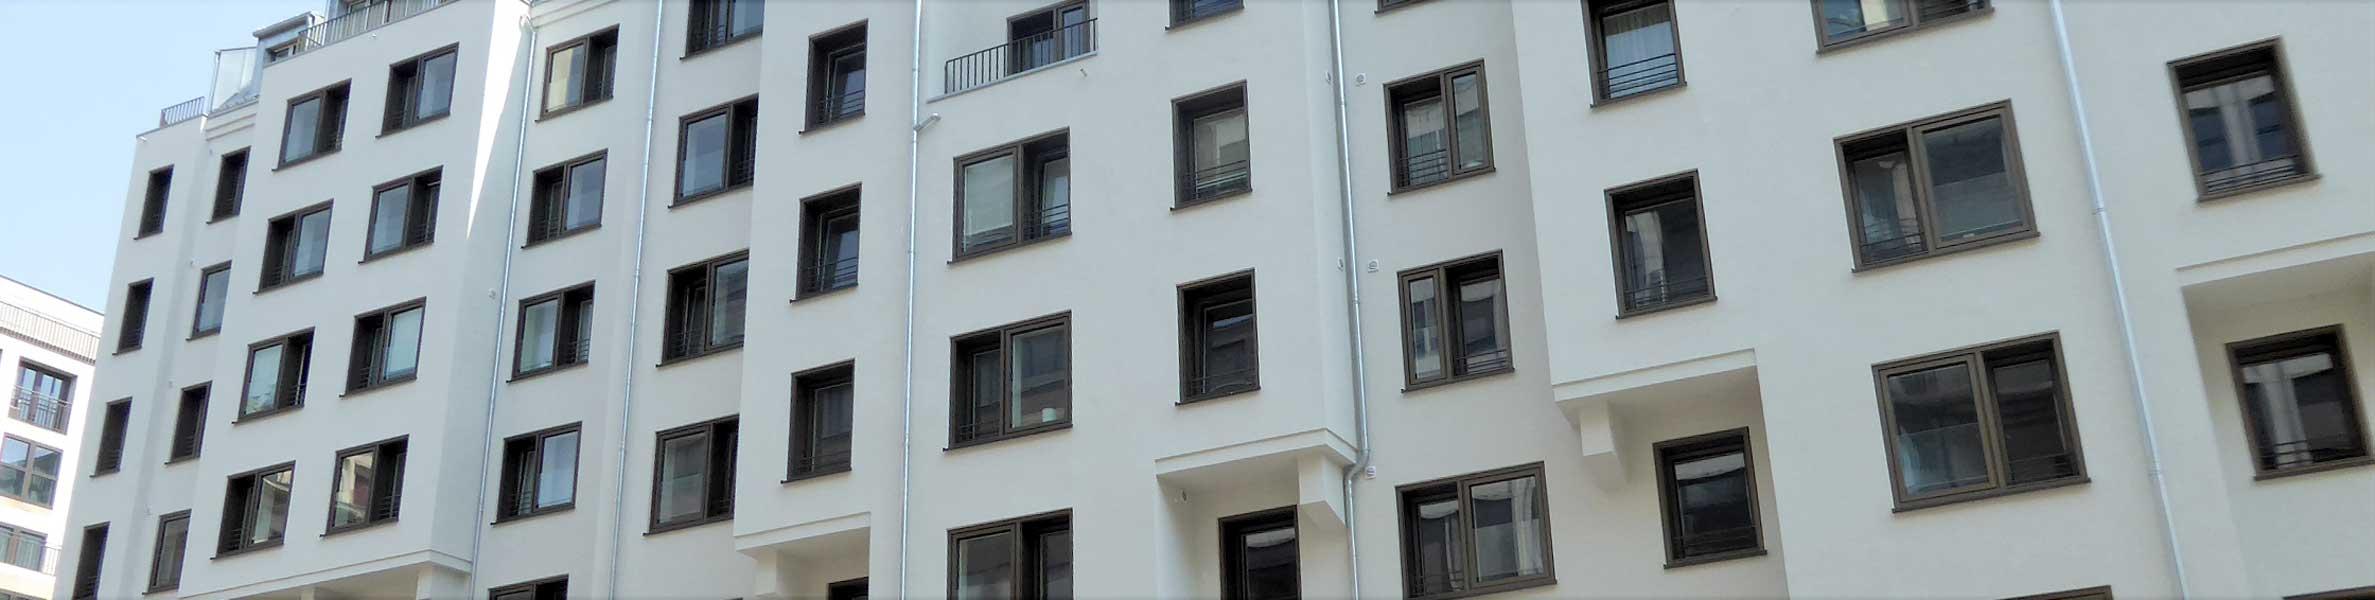 timm-fensterbau-berlin-friedrichstrasse-plattenbau-fassade